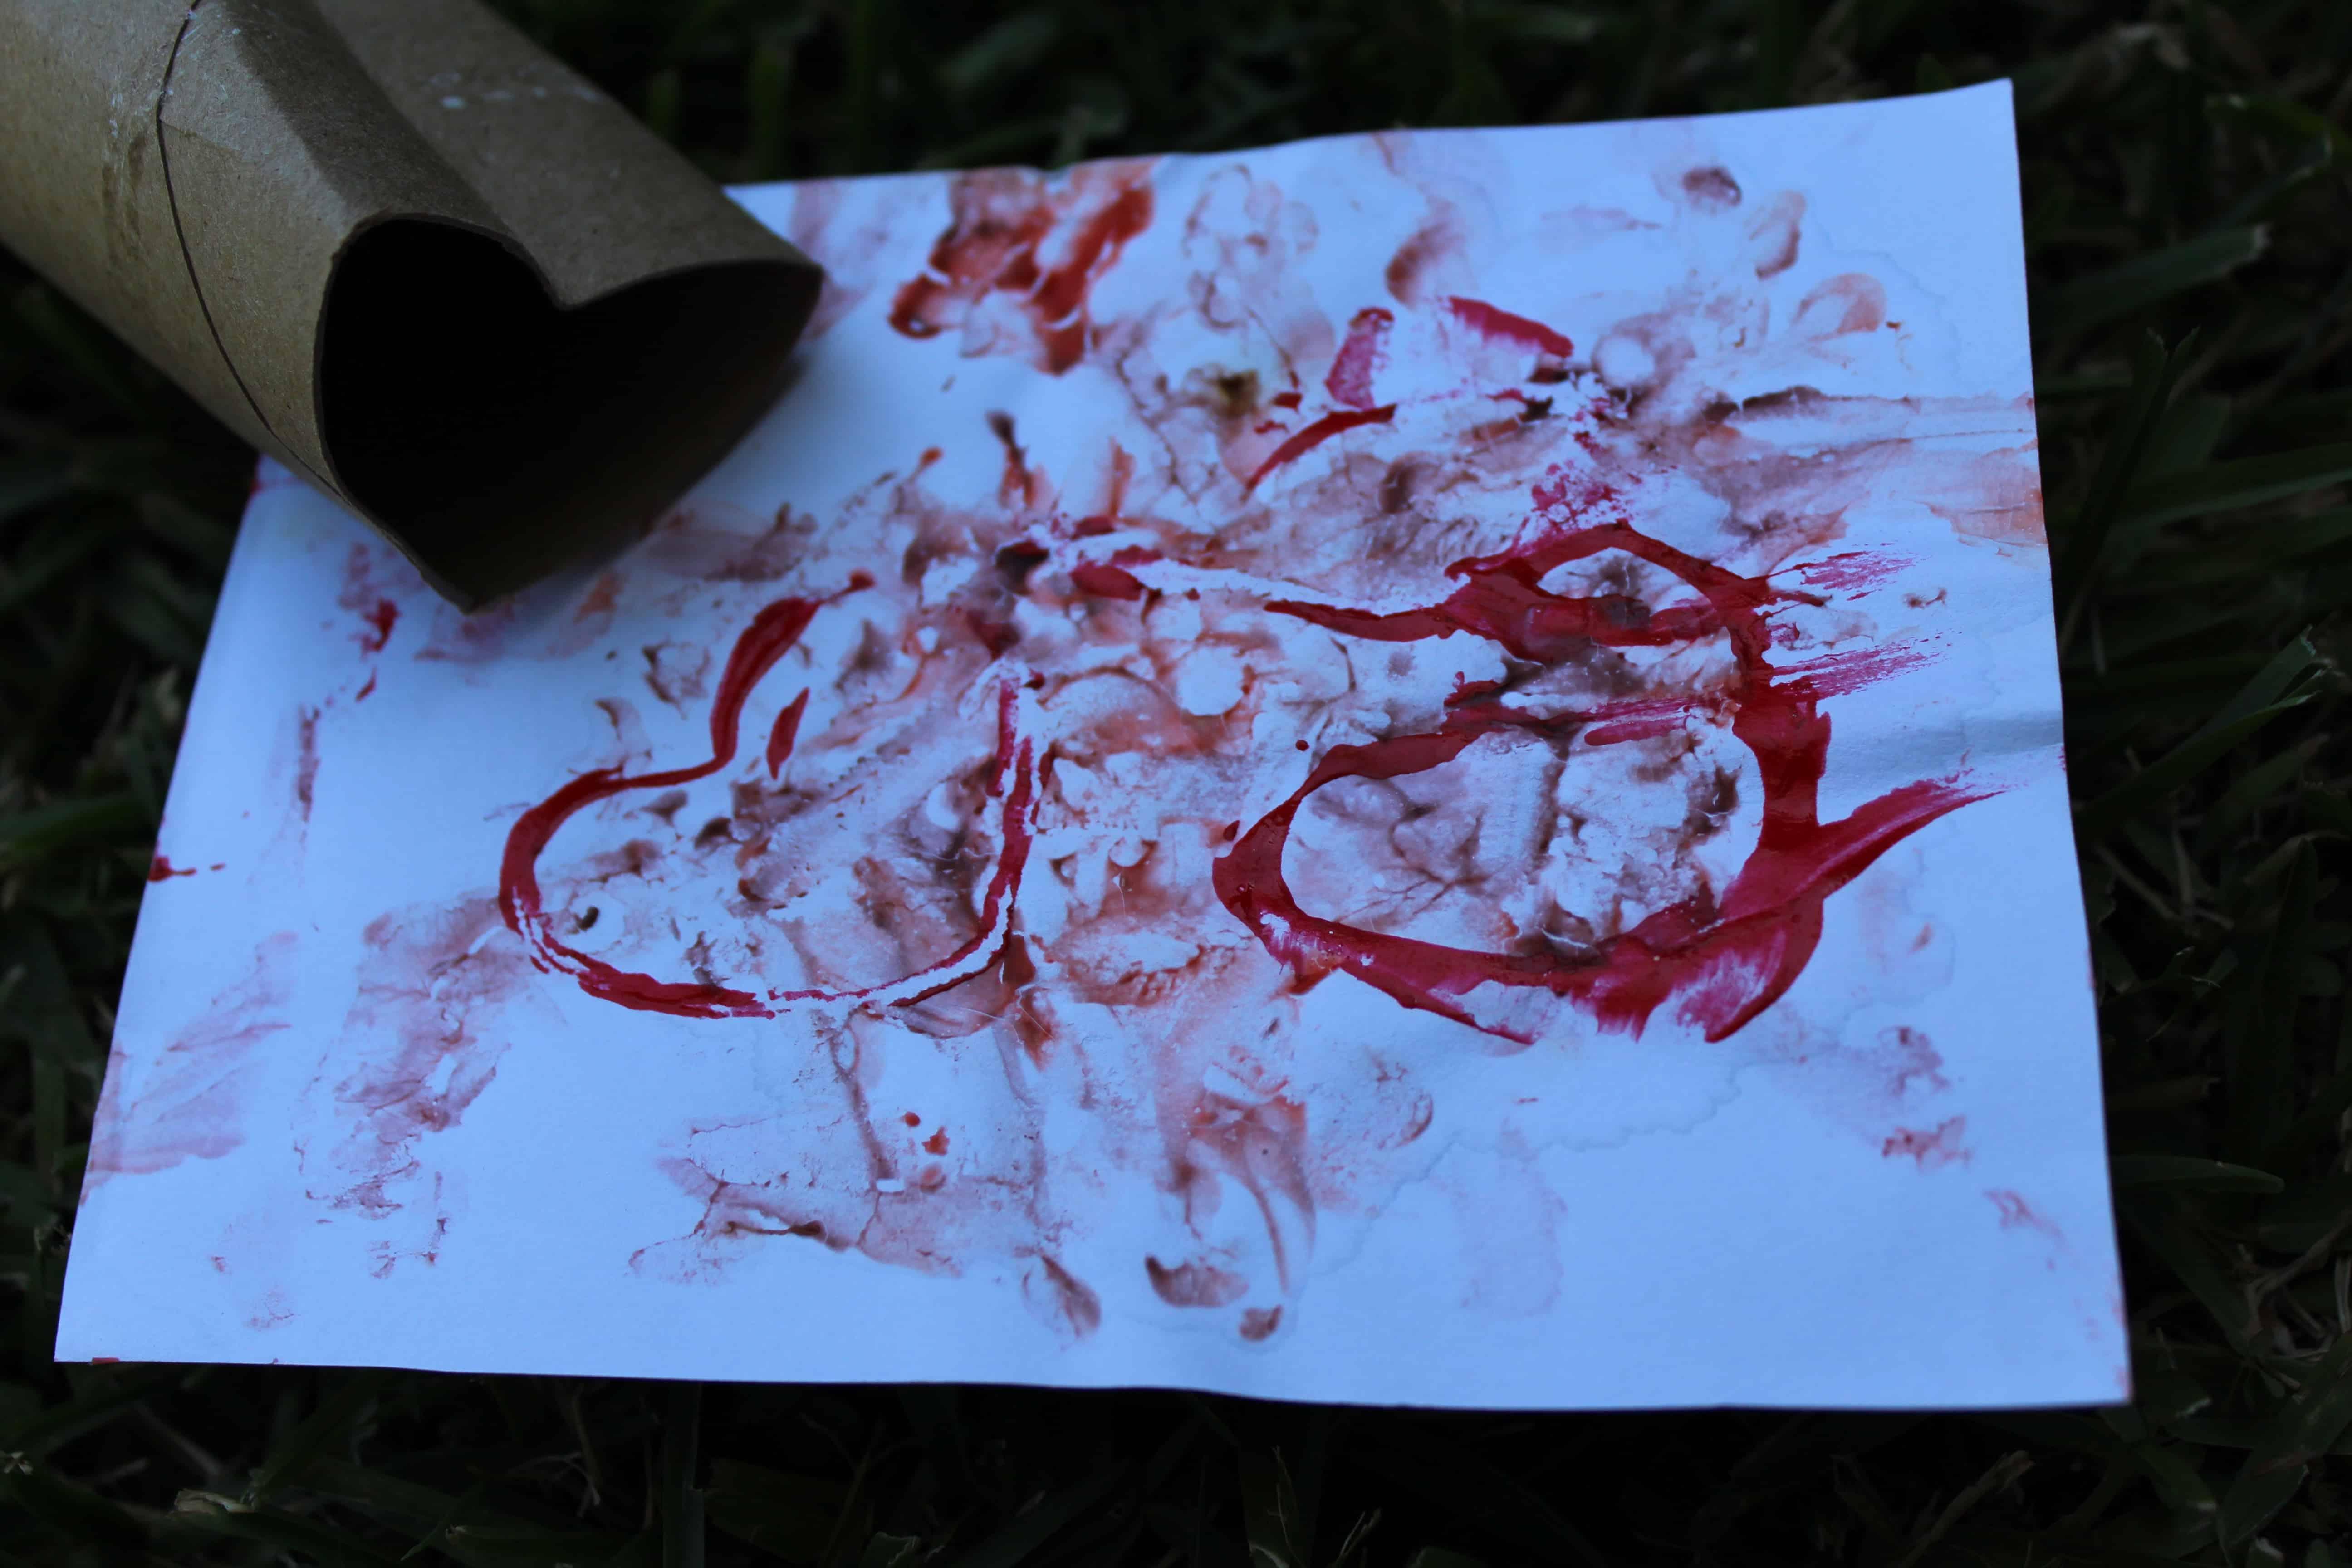 toilet paper tube bent into heart shape; yogurt painting